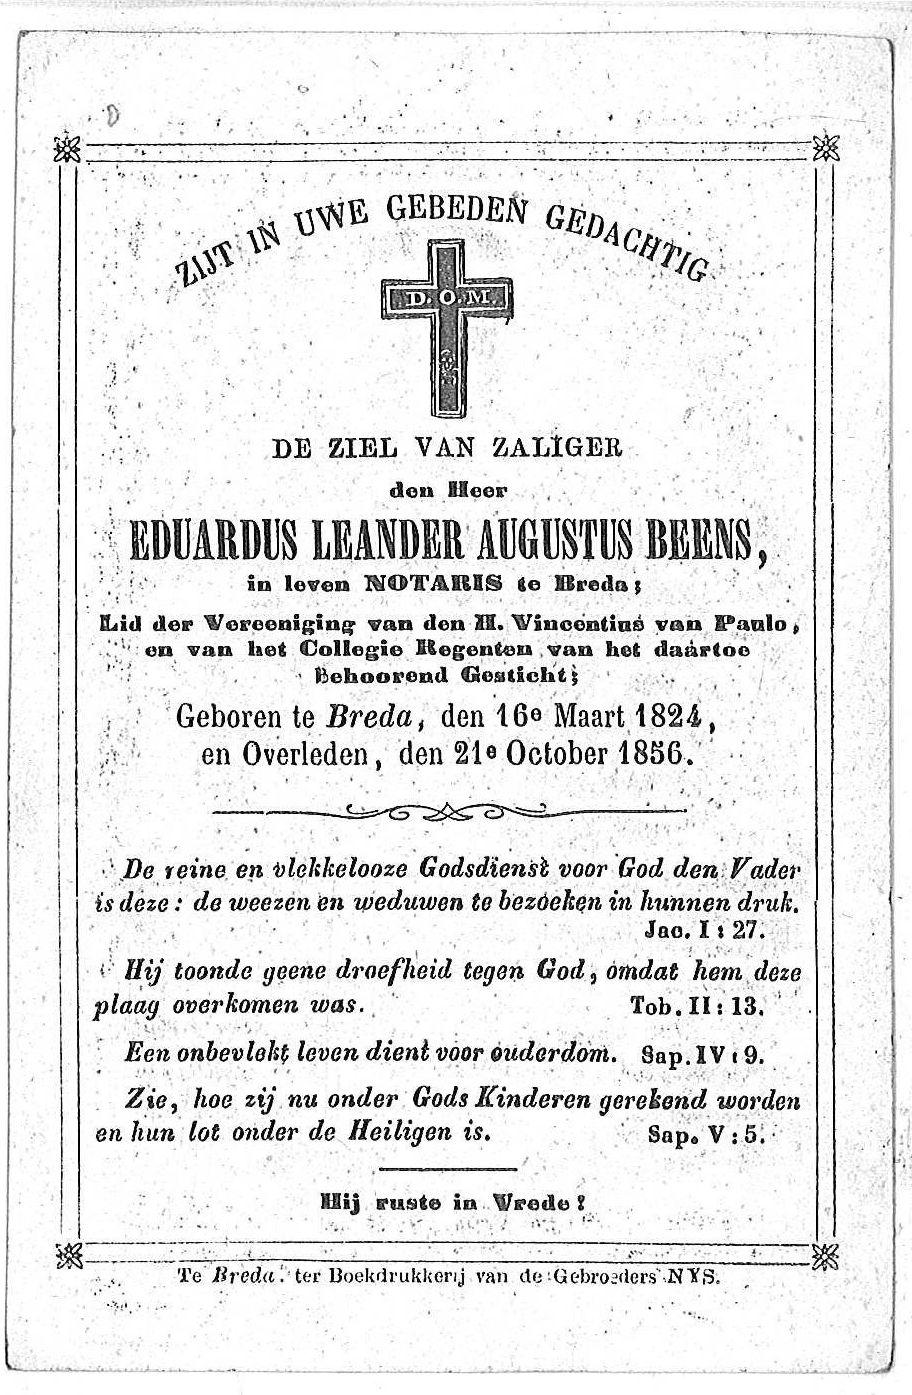 Eduardus Leander Augustus Beens